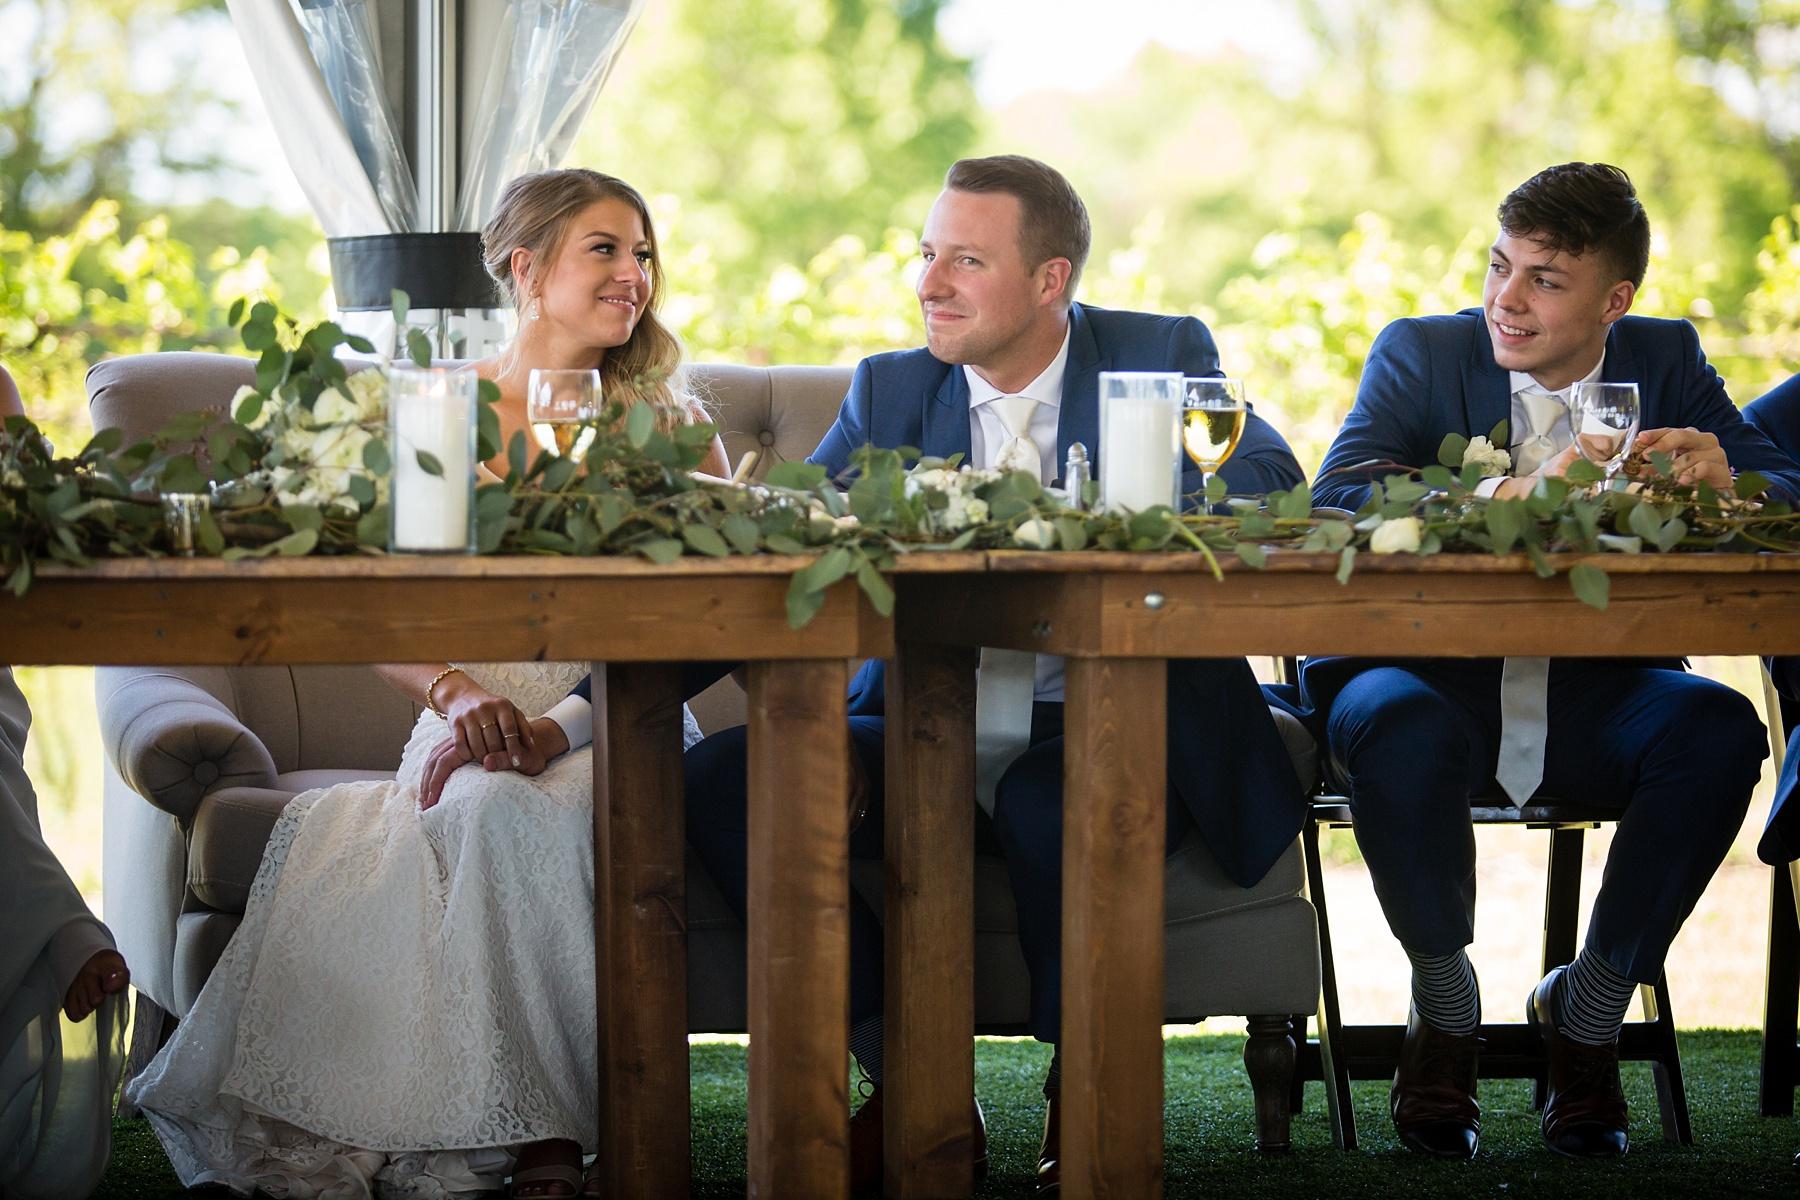 Brandon_Shafer_Photography_Kara_Doug_12_corners_Wedding_Benton_Harbor_0059.jpg